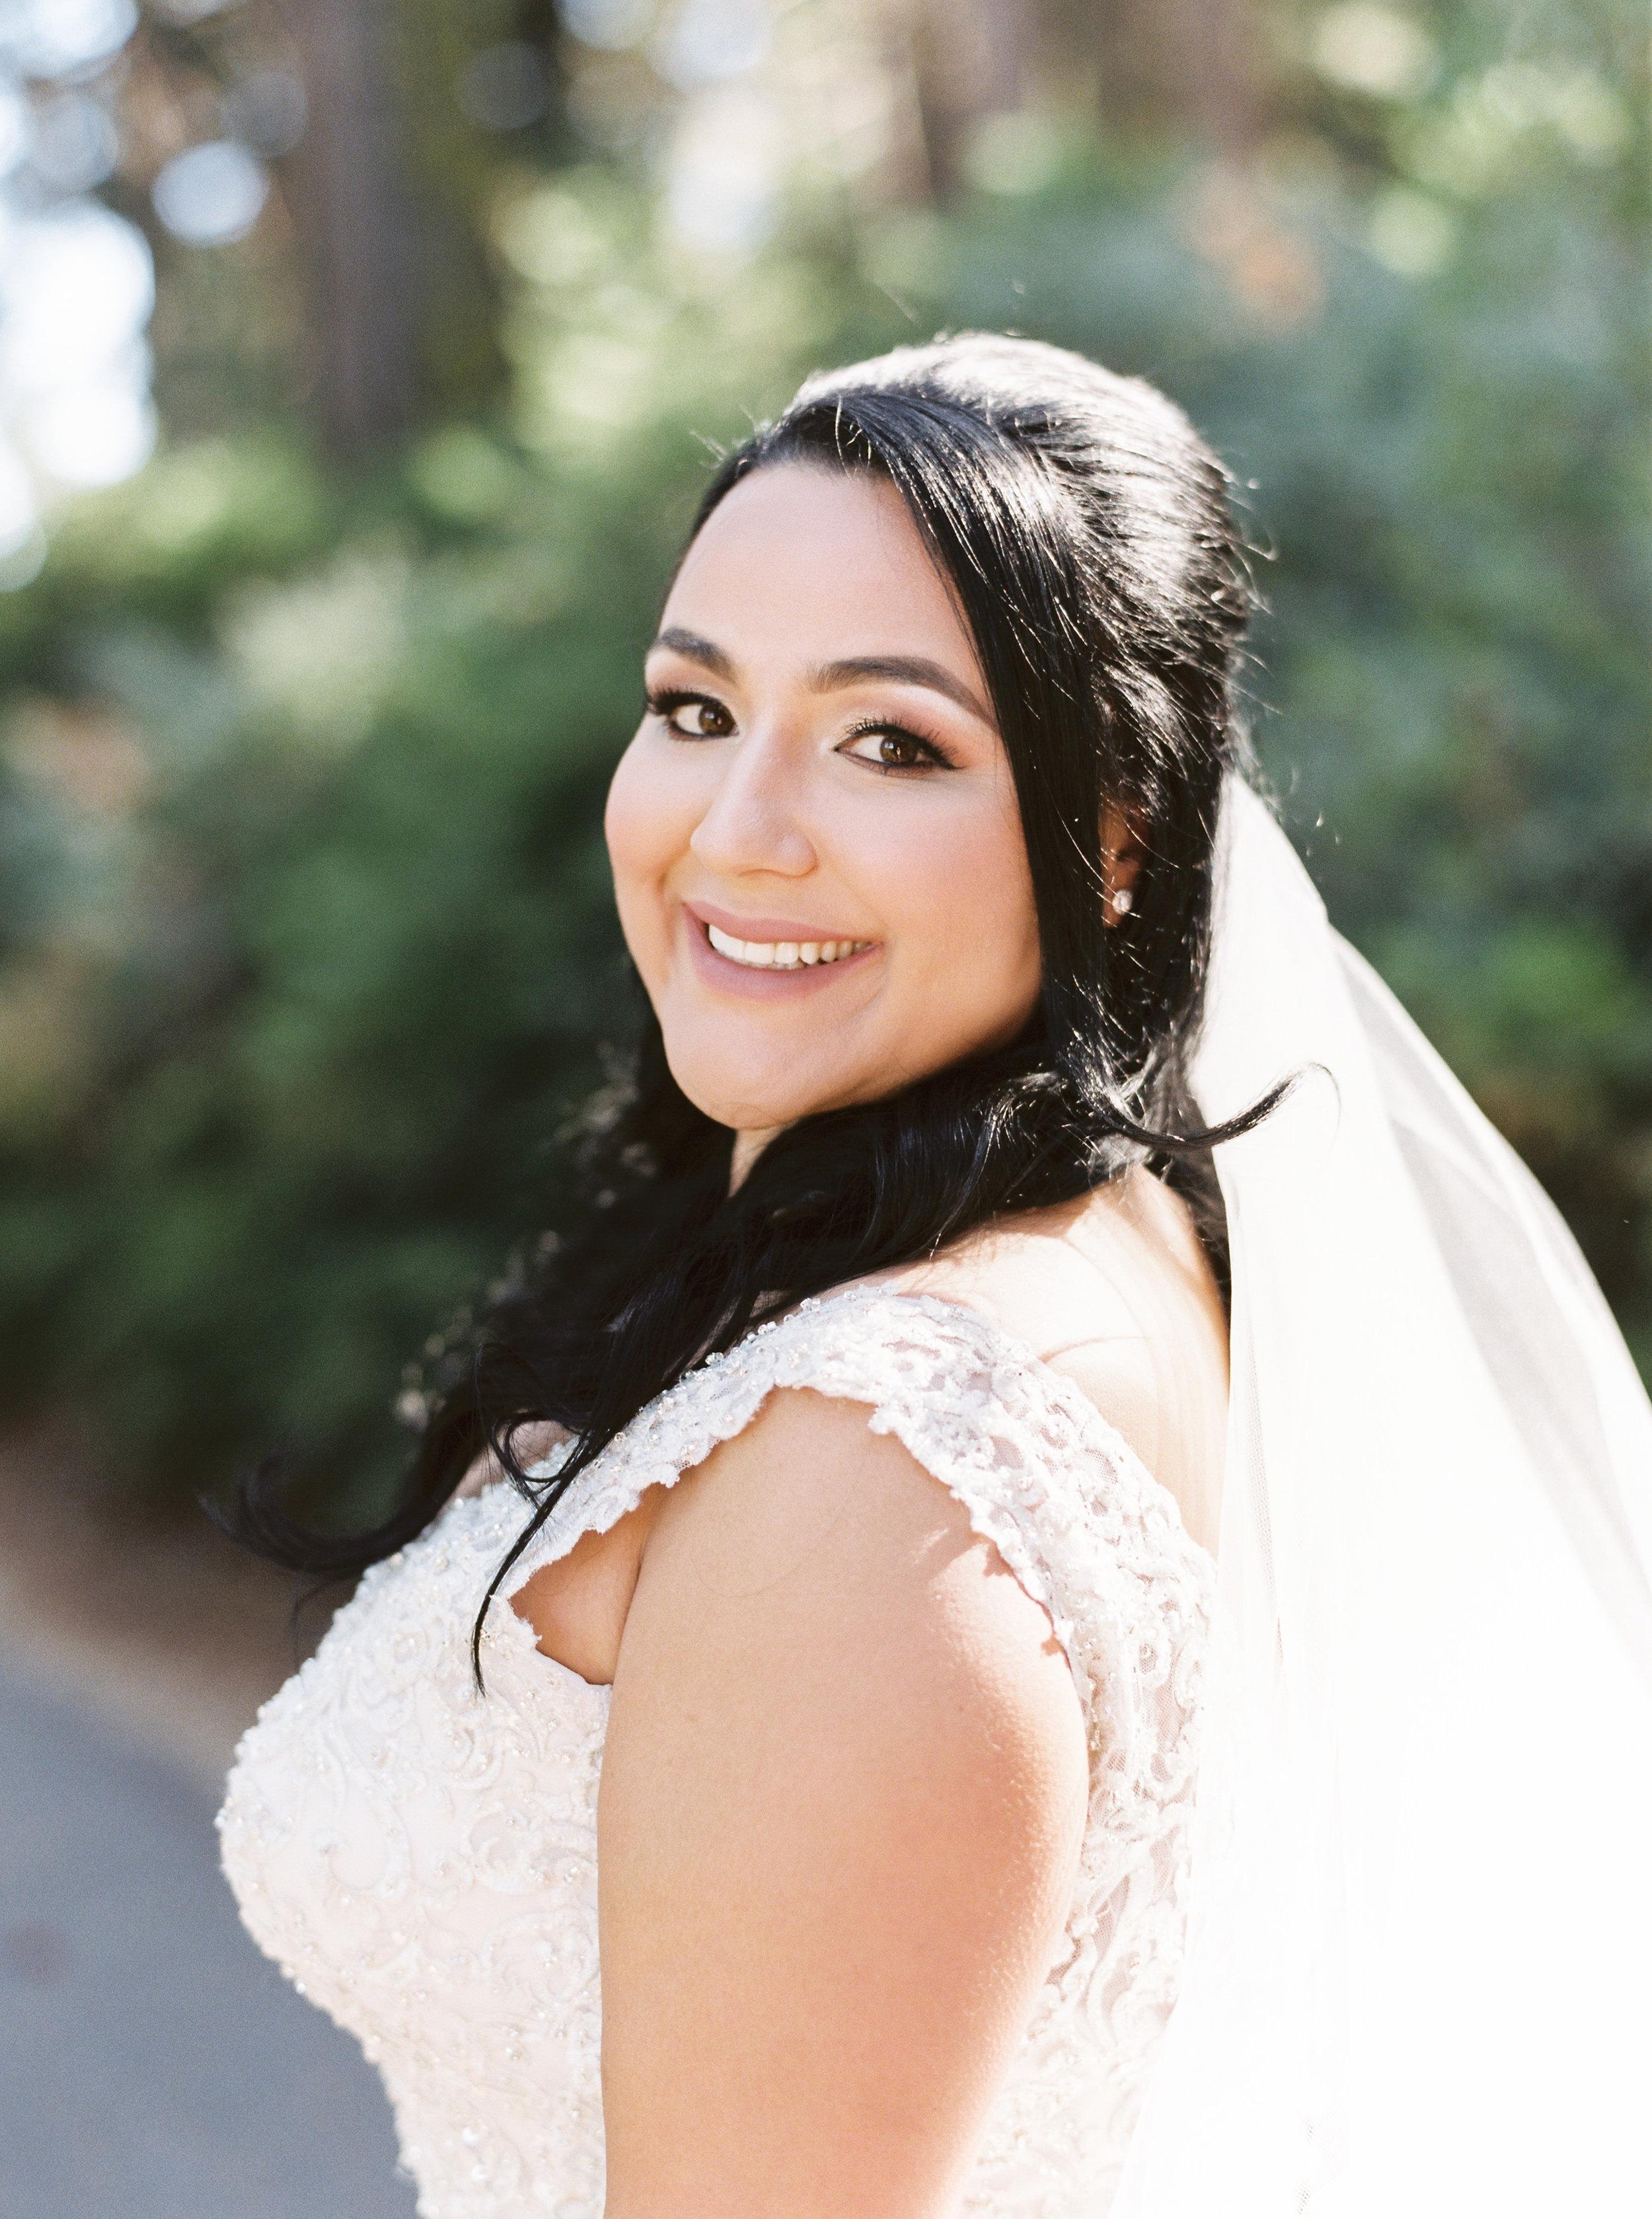 Tenaya-lodge-wedding-at-yosemite-national-park-california-26.jpg